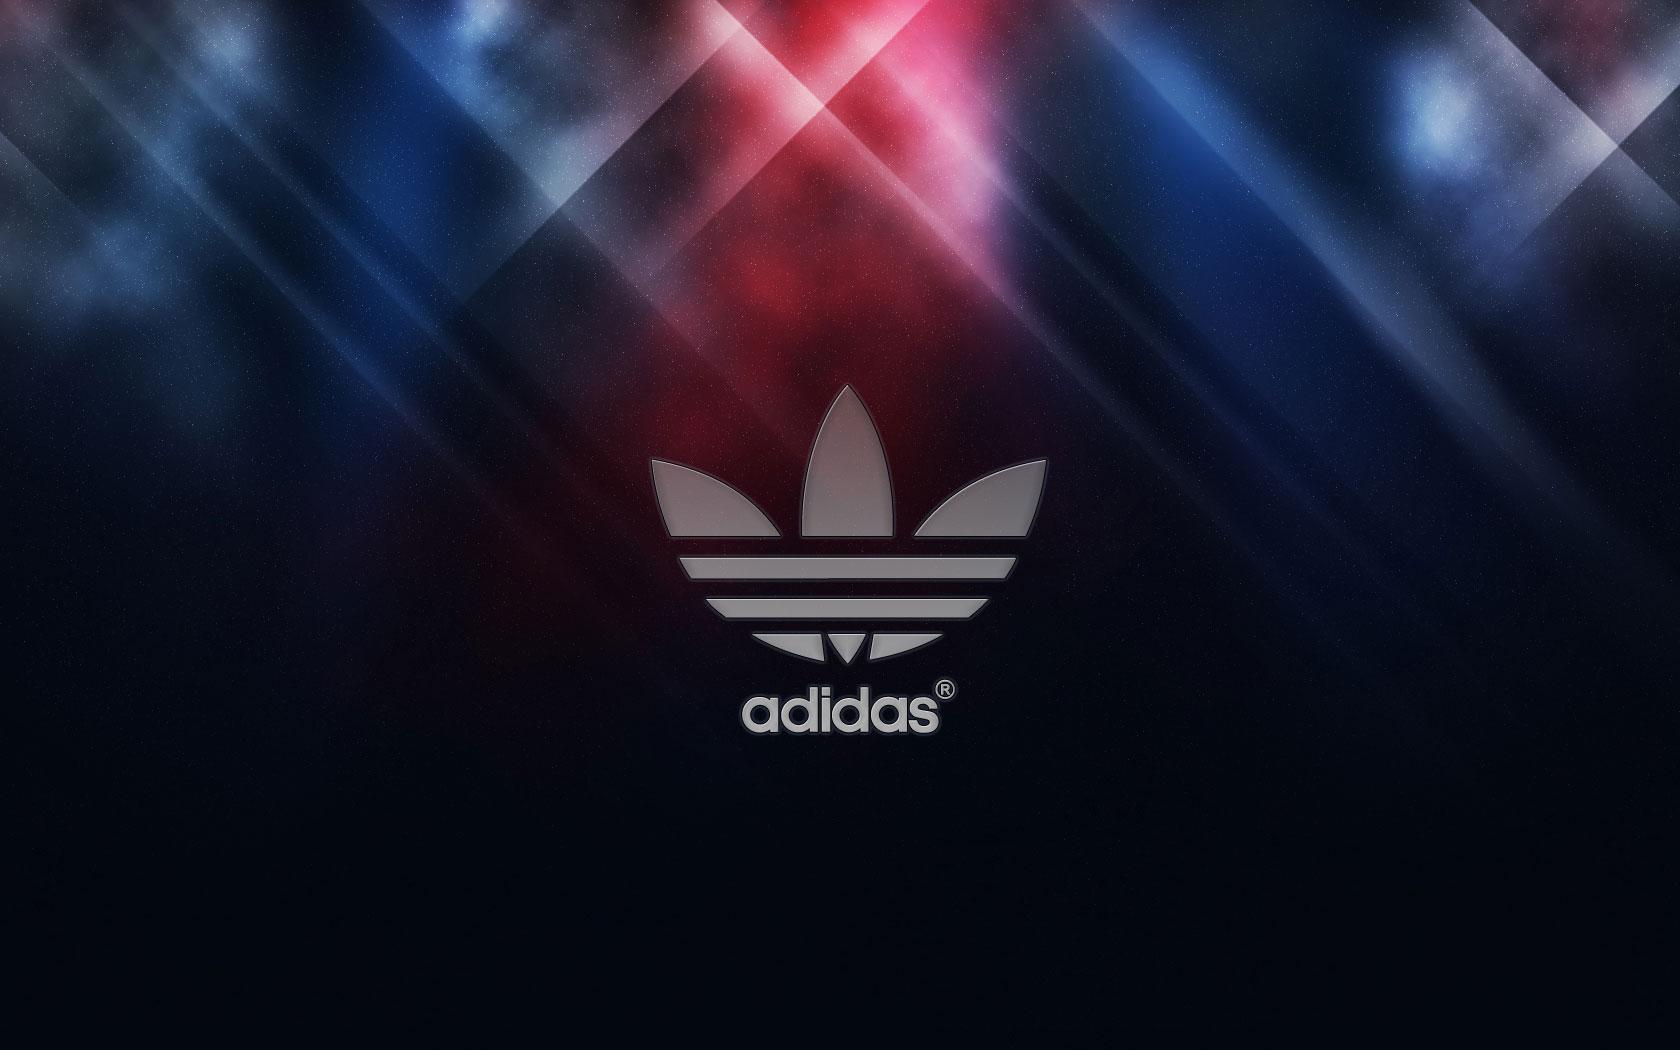 Adidas Logo Wallpaper 4167 Hd Wallpapers in Logos   Imagescicom 1680x1050